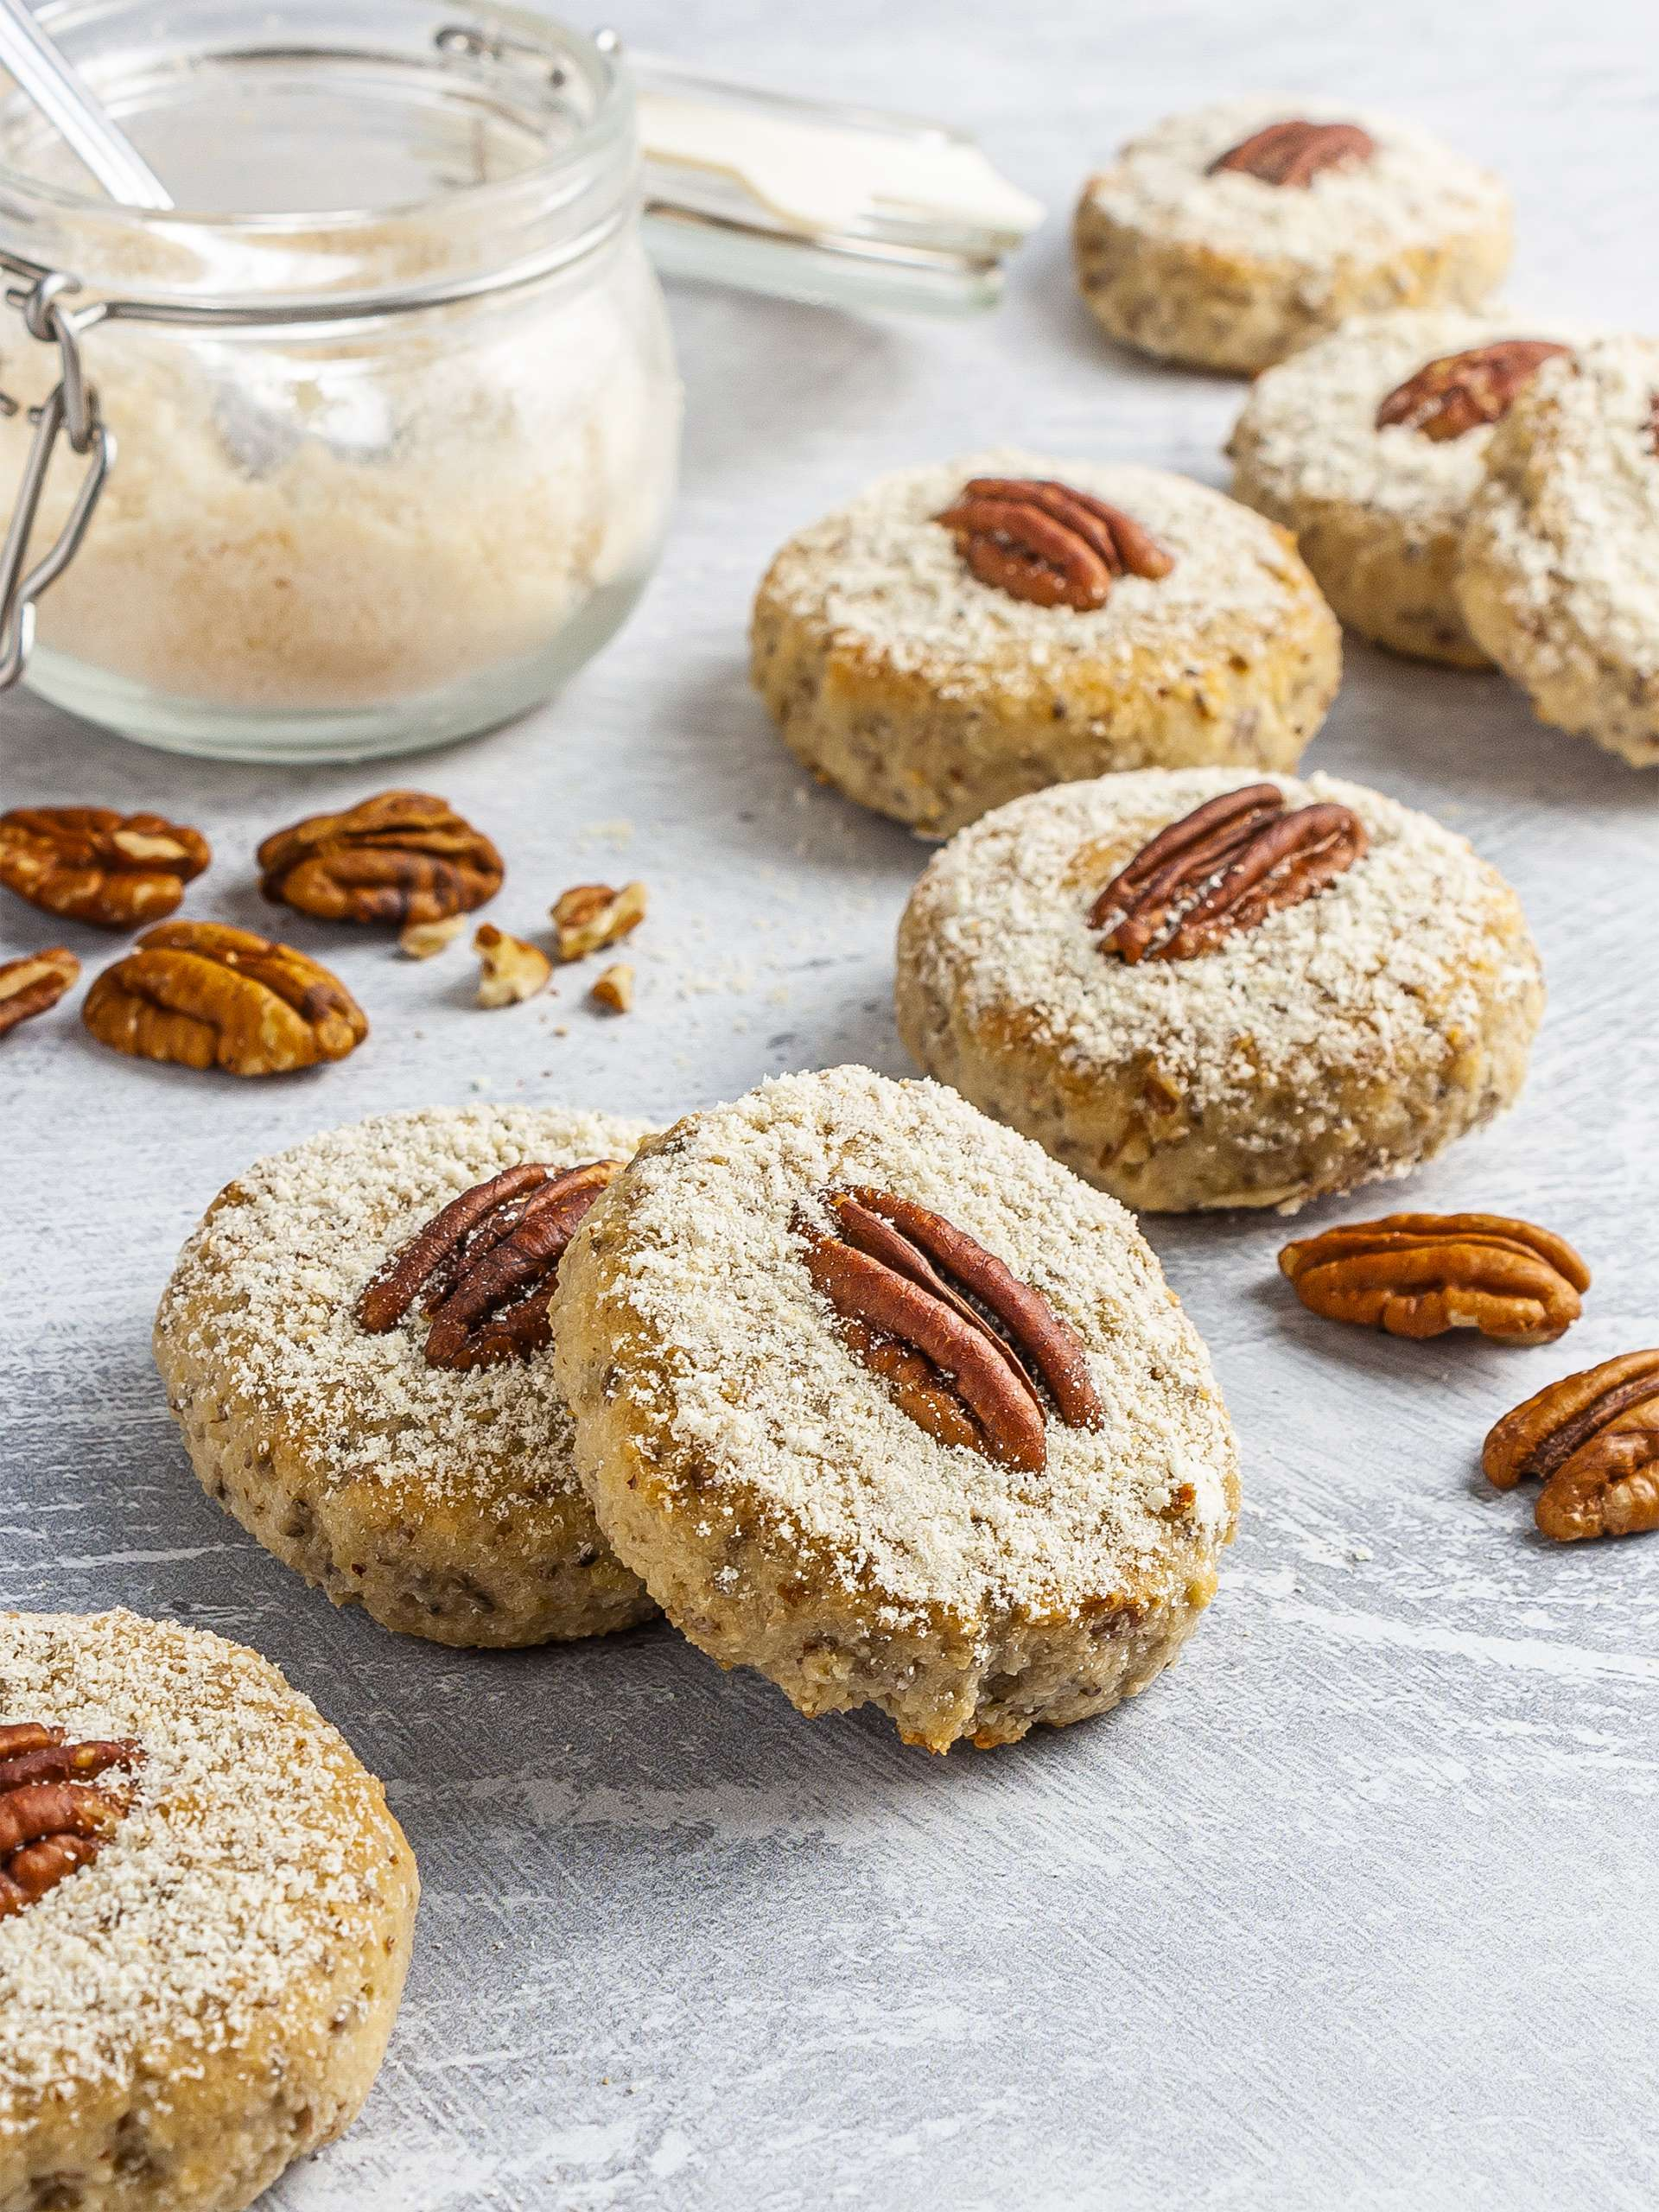 {Keto, Vegan, Gluten-free} Pecan Sandies